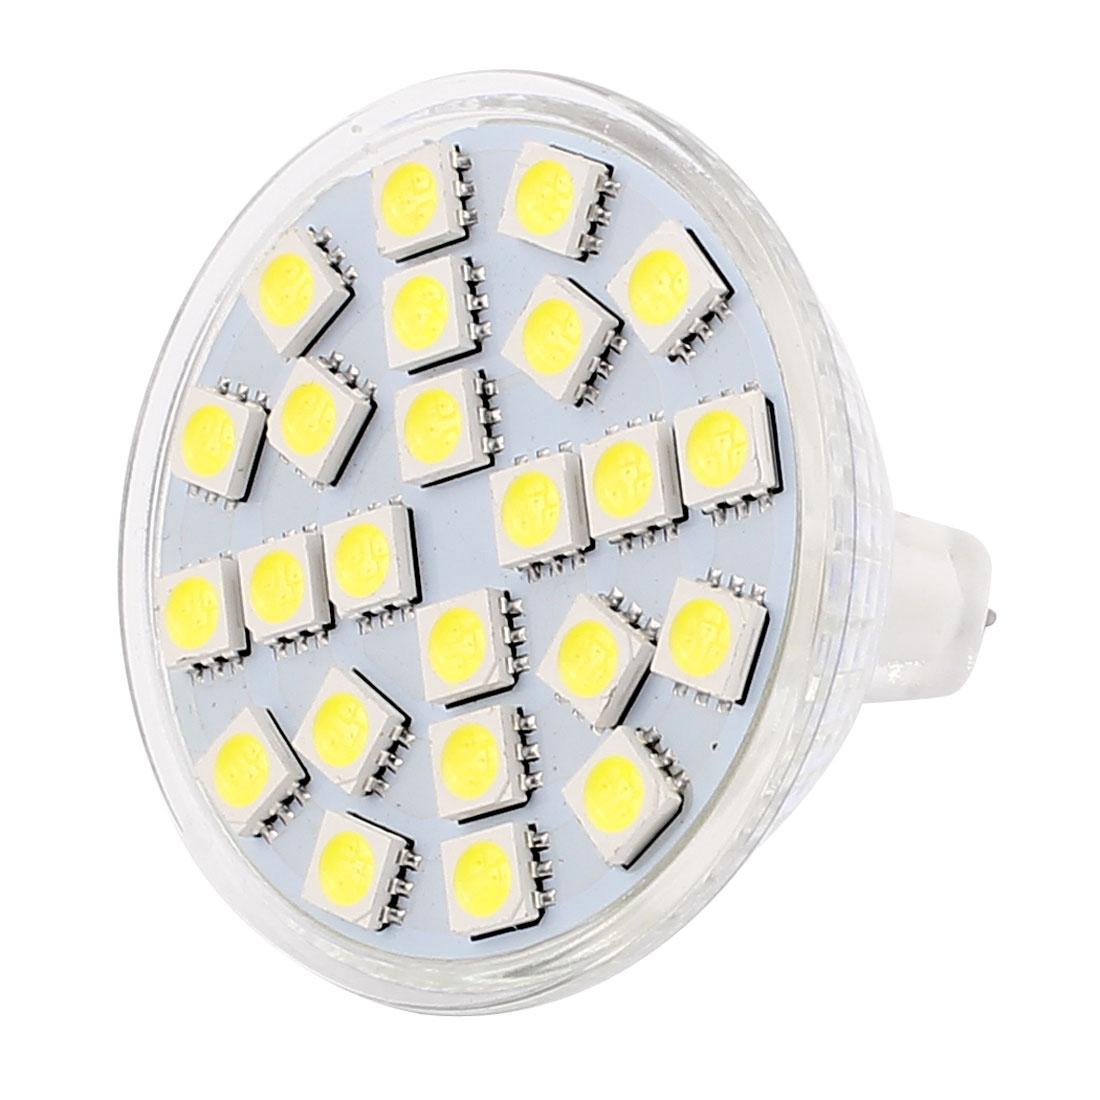 MR16 AC 110V 3W SMD5050 24LEDs Glass Energy Saving LED Lamp Bulb White